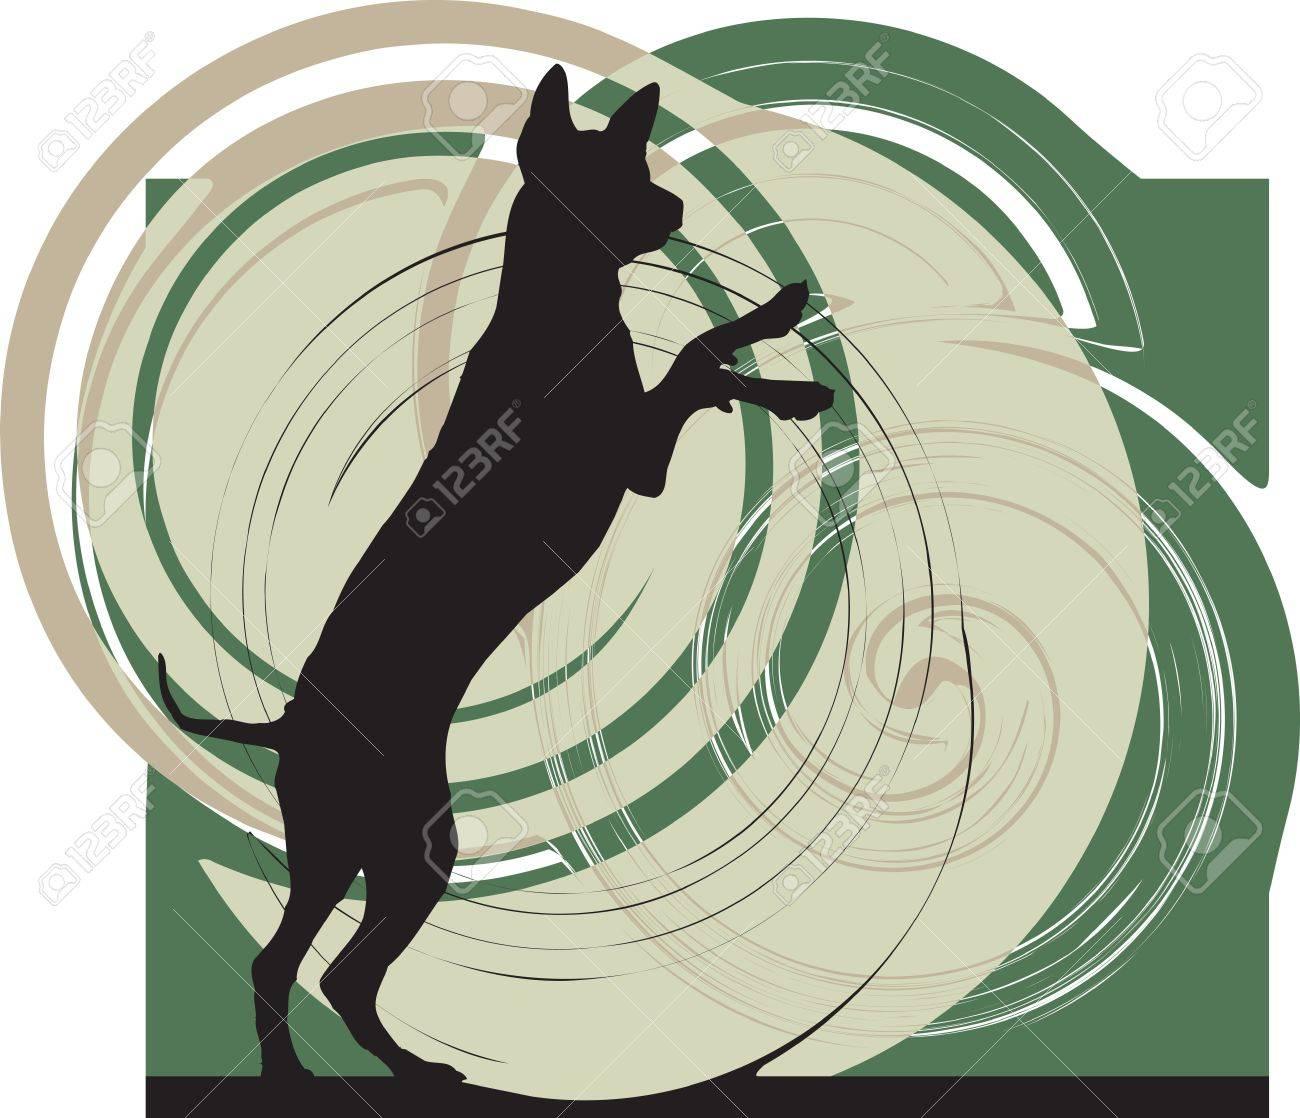 Dog, vector illustration Stock Vector - 10999270